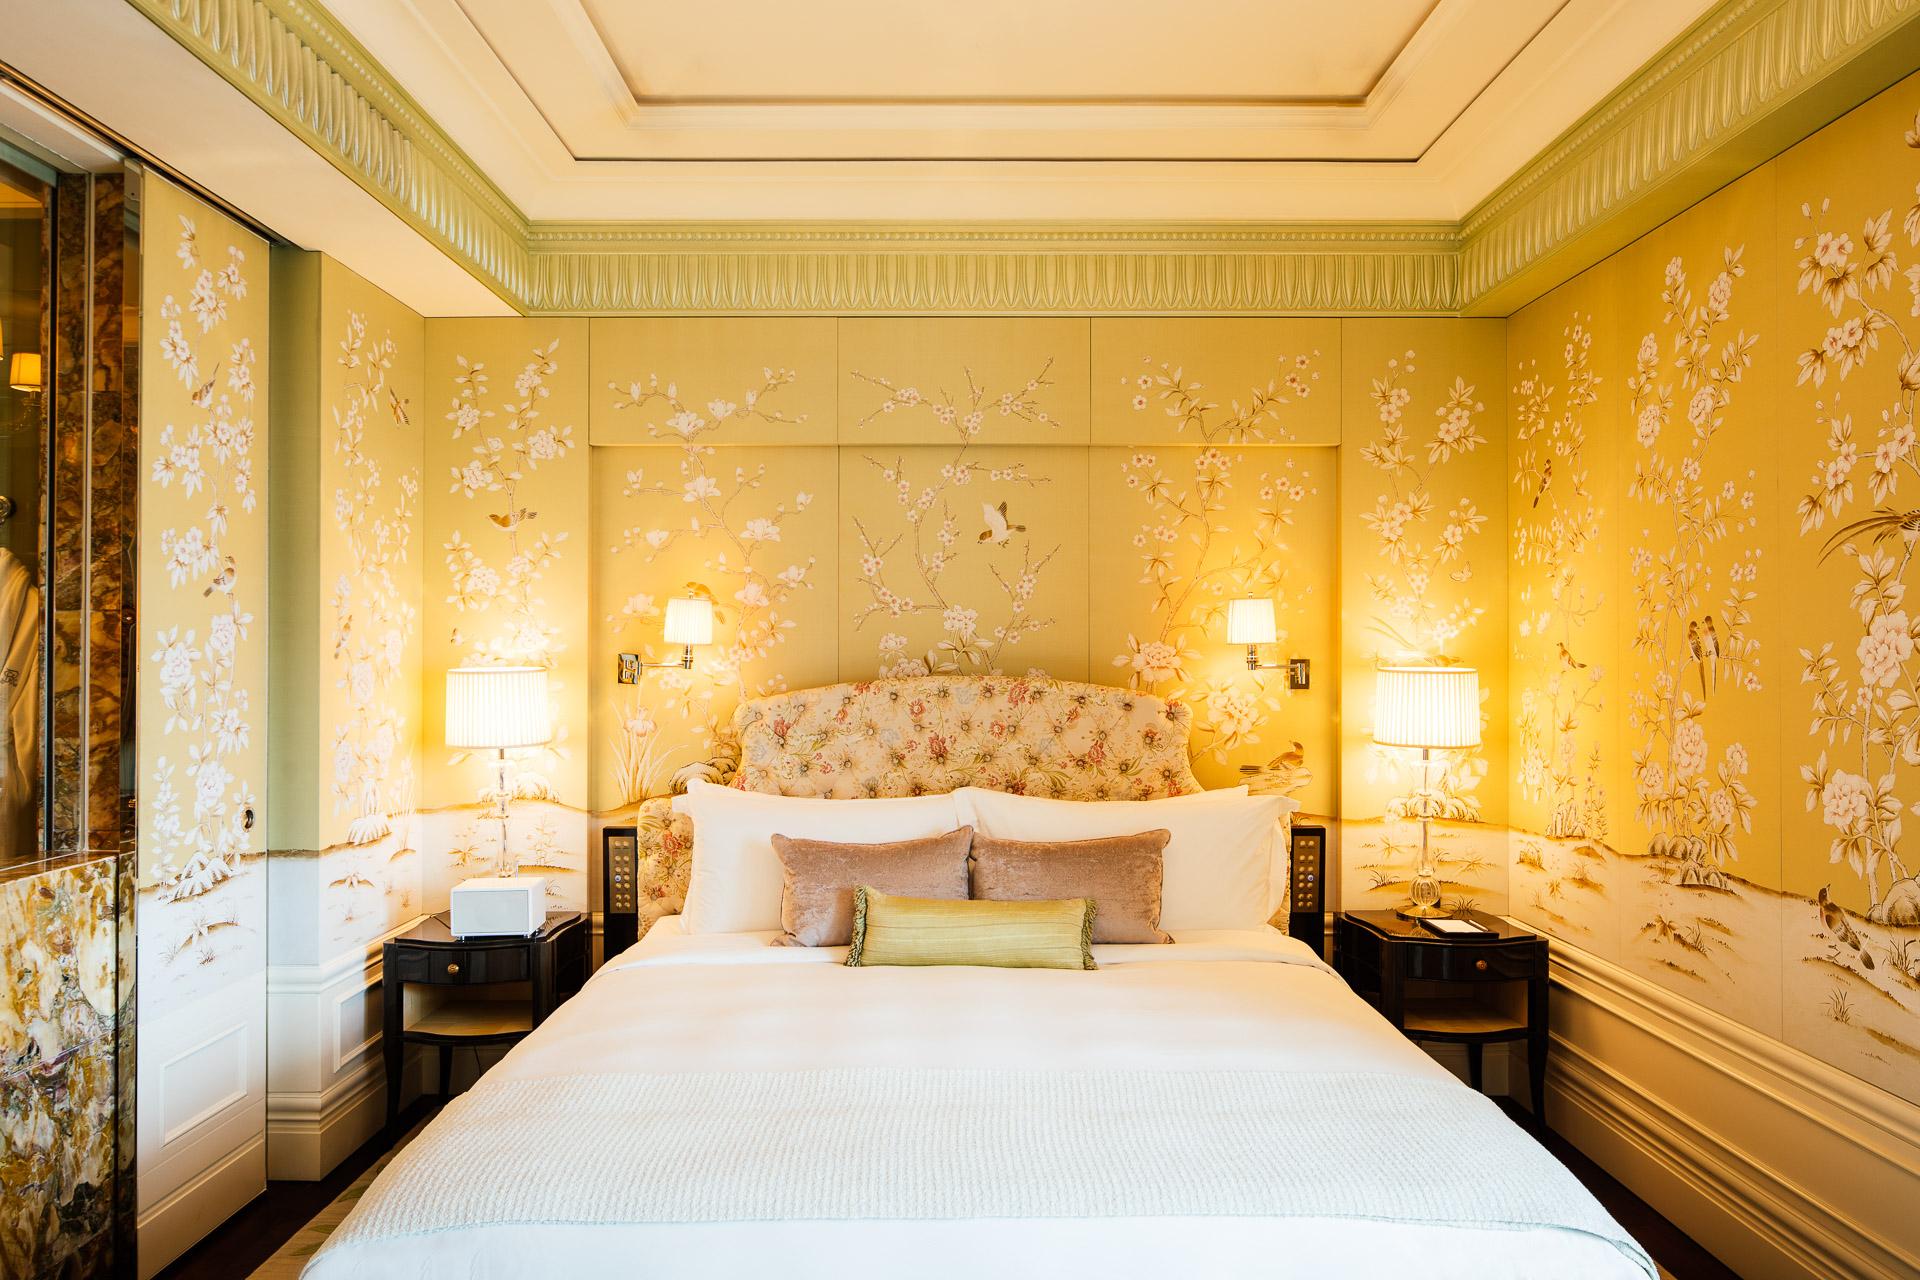 st-regis-singapore-marriott-luxury-hotel-photographer-21.jpg